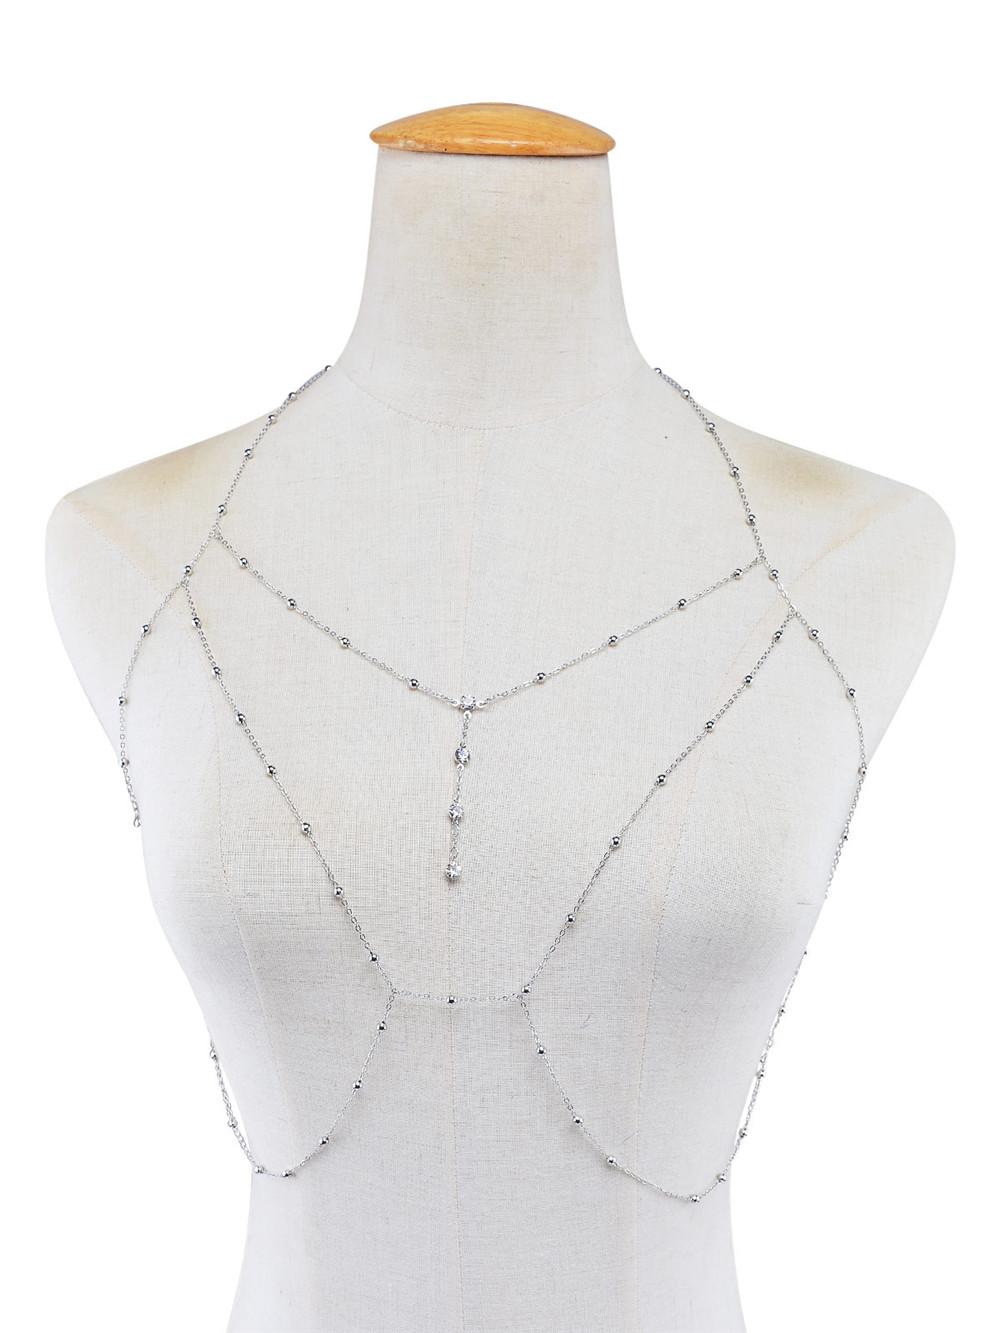 GIVVLLRY Rhinestones Tassel Body Chain Sexy Beach Gold Silver Color Wedding Accessories Bra Cross Body Chain Jewellery for Women 6